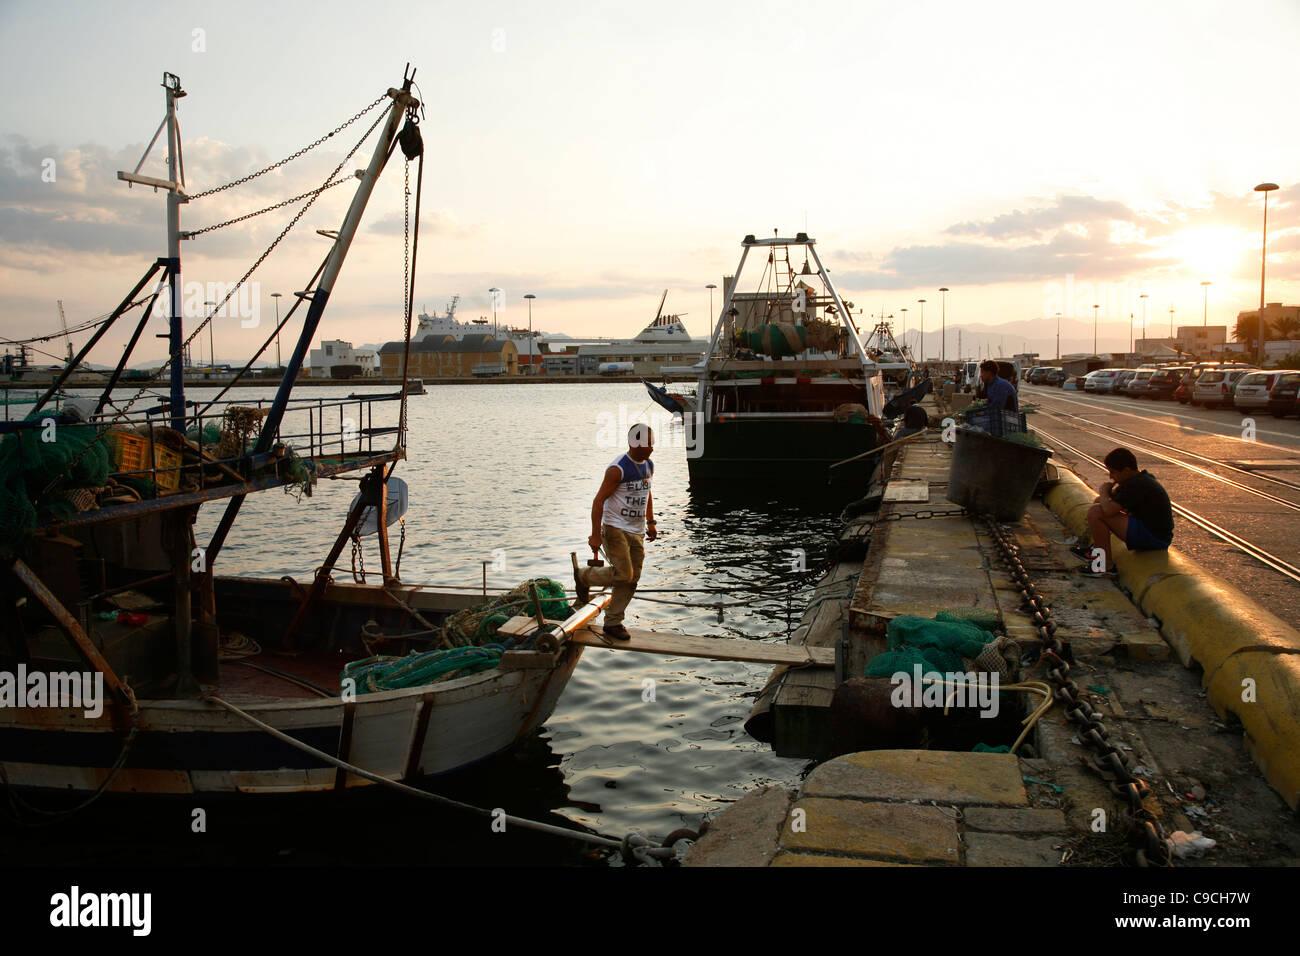 fishermen at the port, Cagliari, Sardinia, Italy. - Stock Image